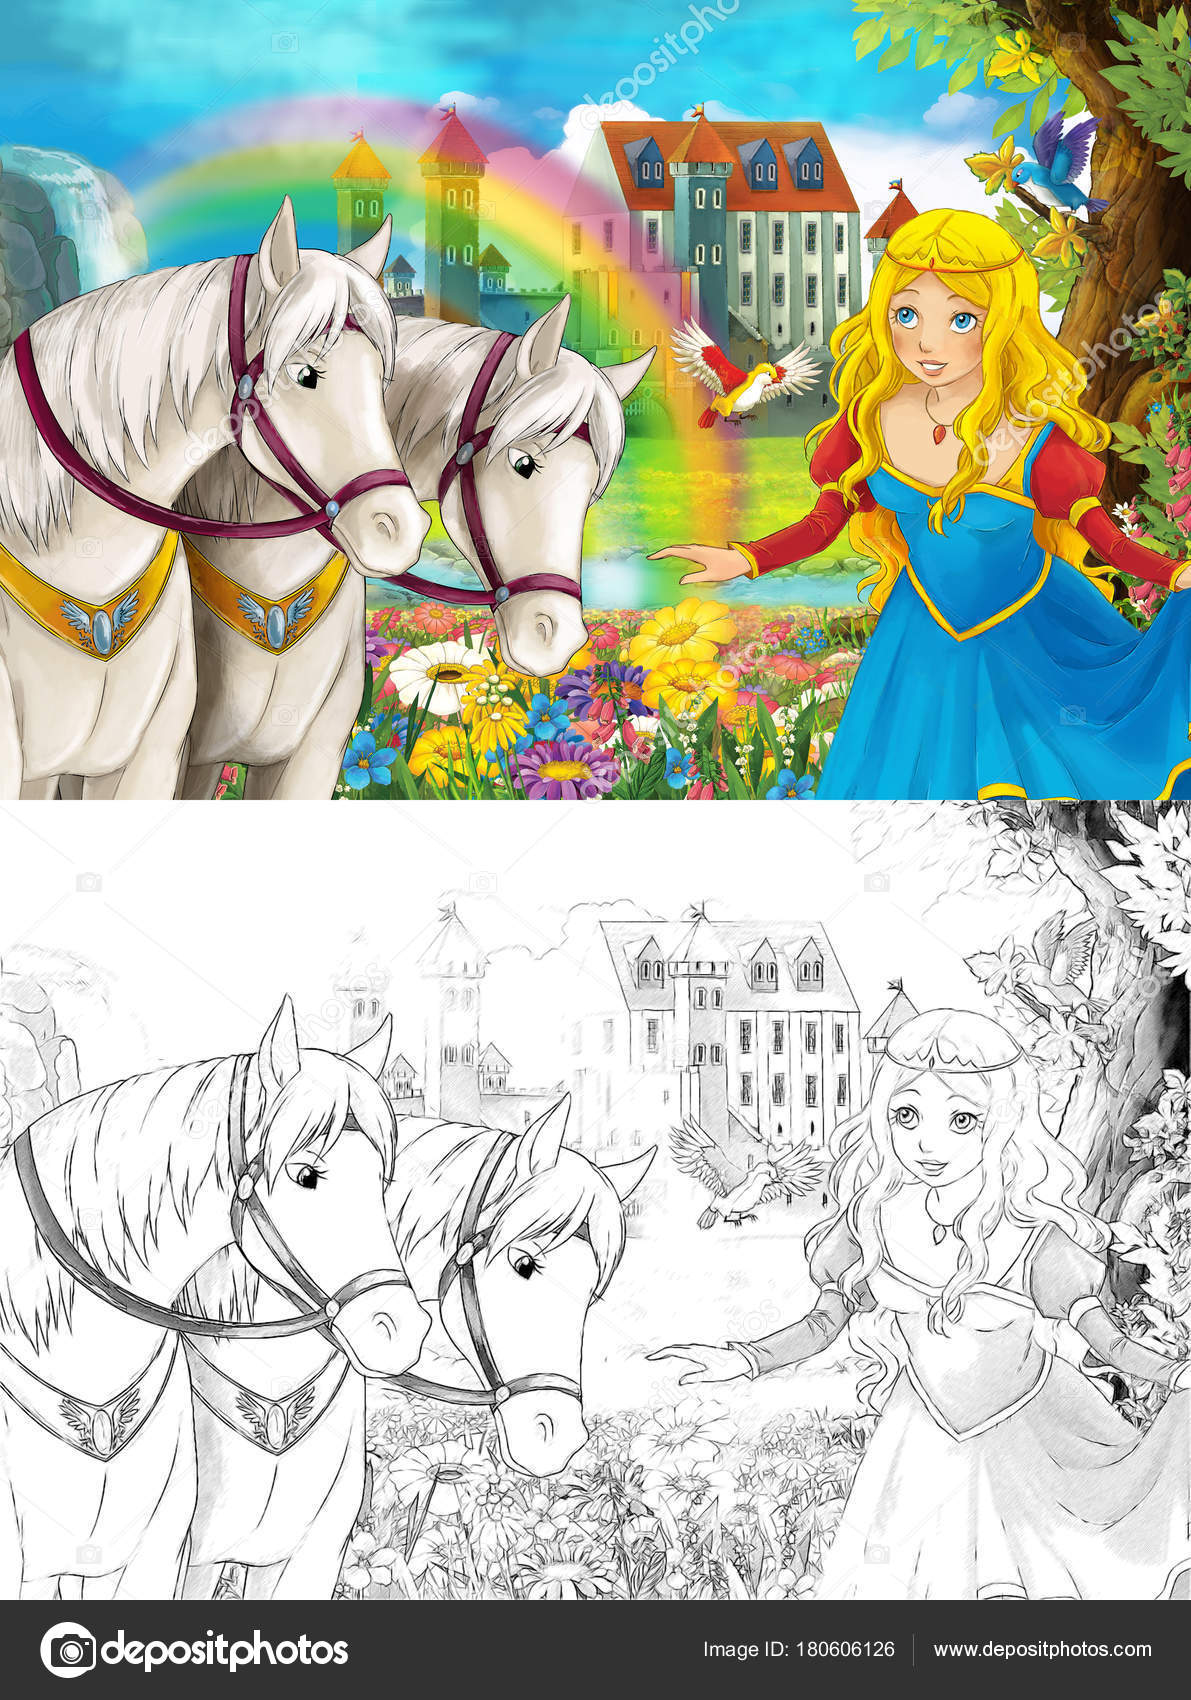 Escena Dibujos Animados Con Joven Princesa Viendo Dos Caballos ...